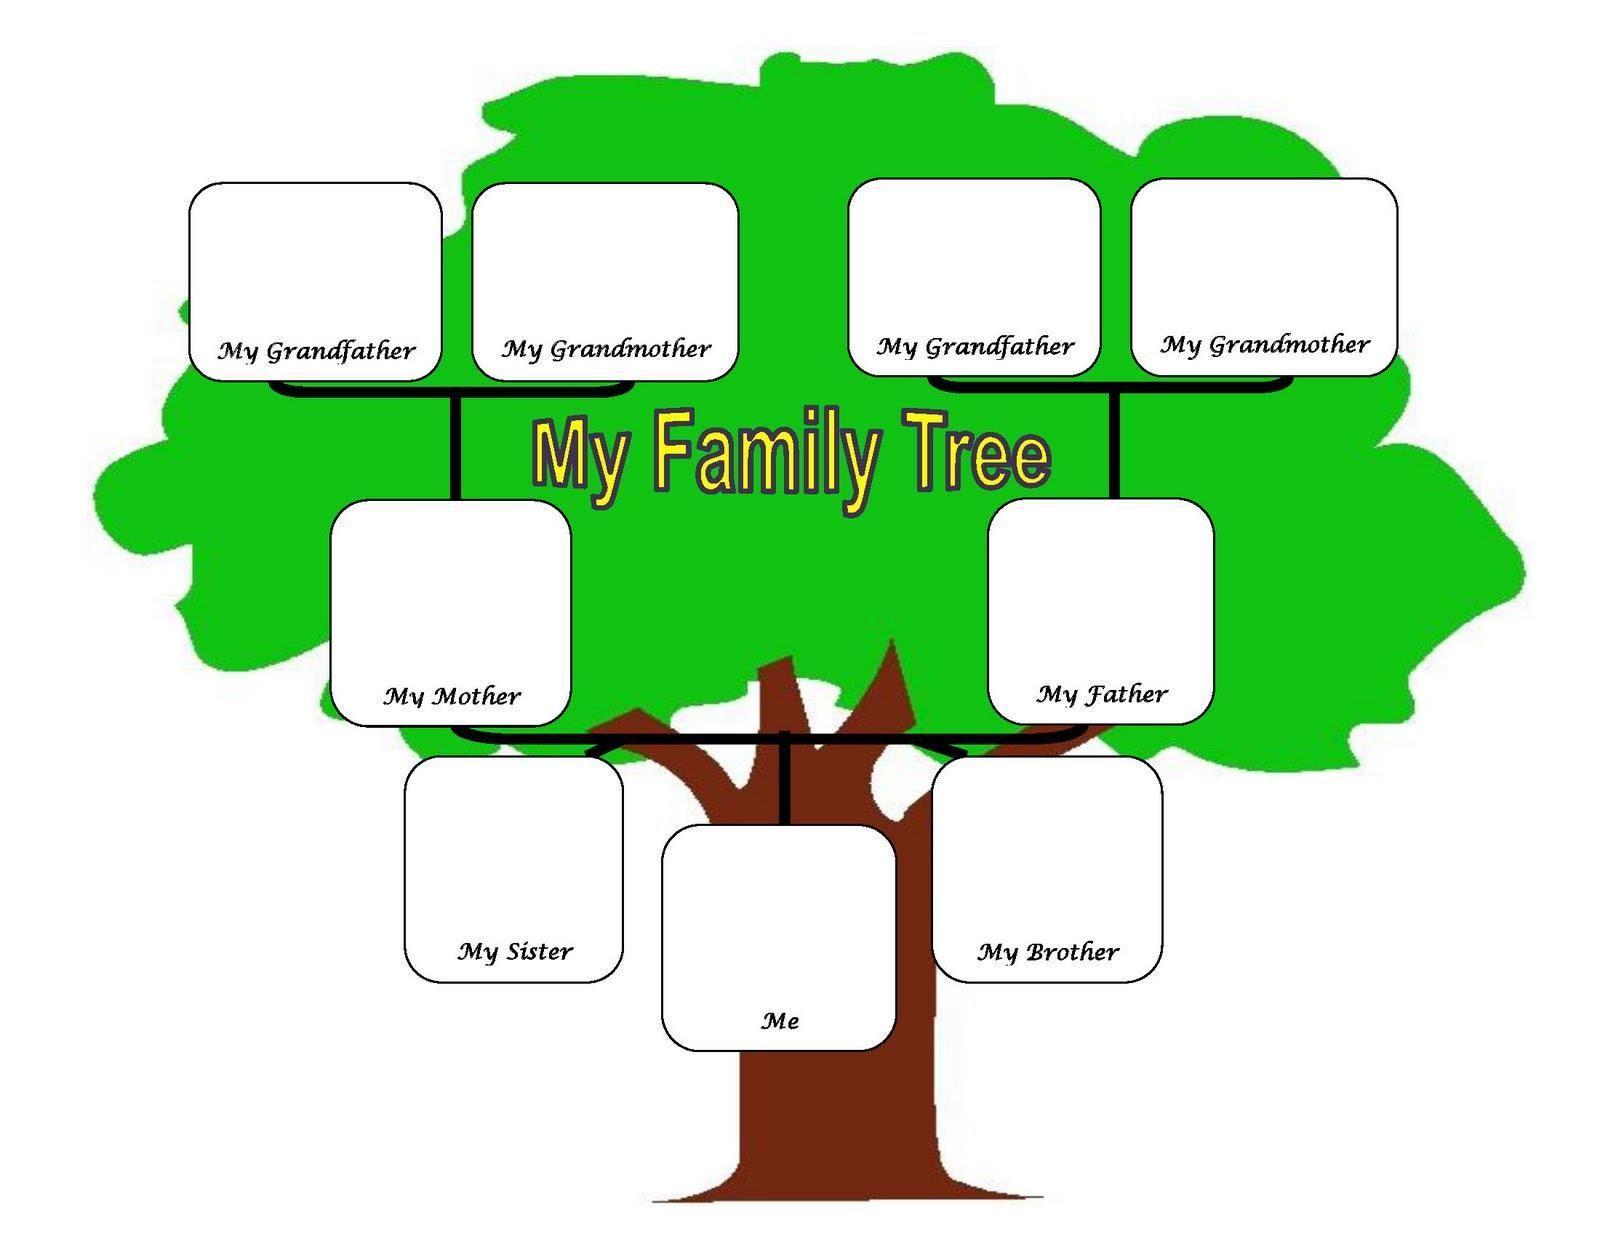 Family Tree Fotolipcom Rich Image And Wallpaper